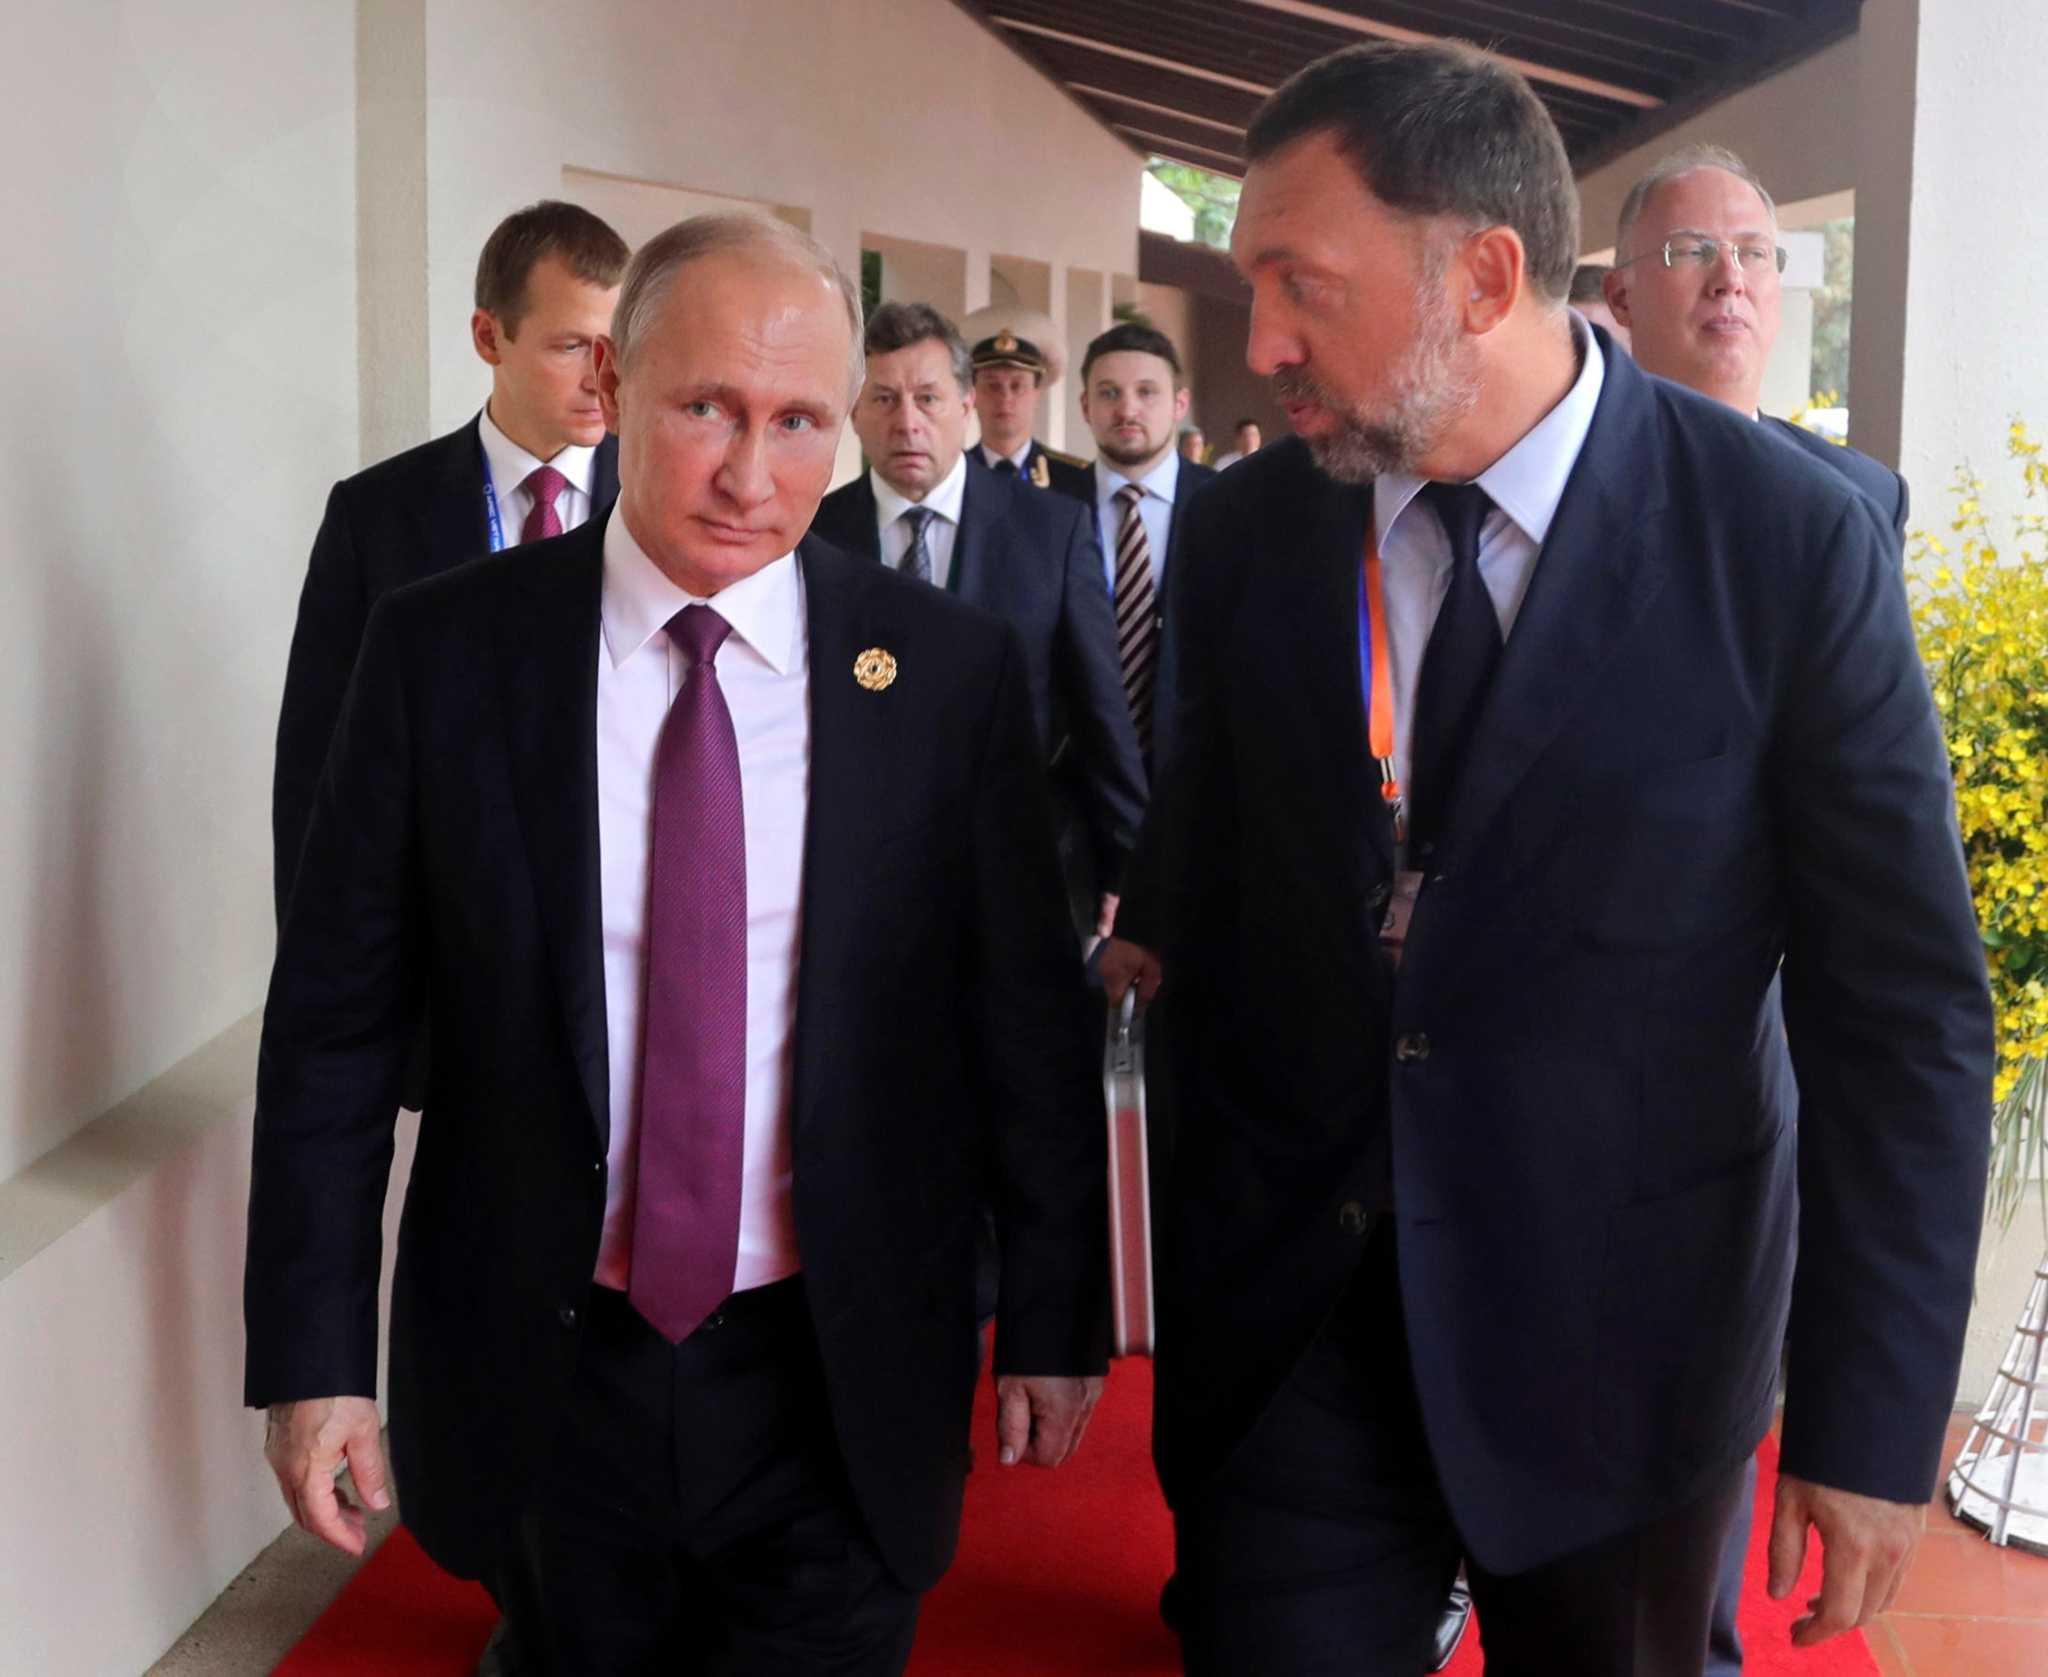 Texas Republicans defect en masse as Trump weakens Russia sanctions